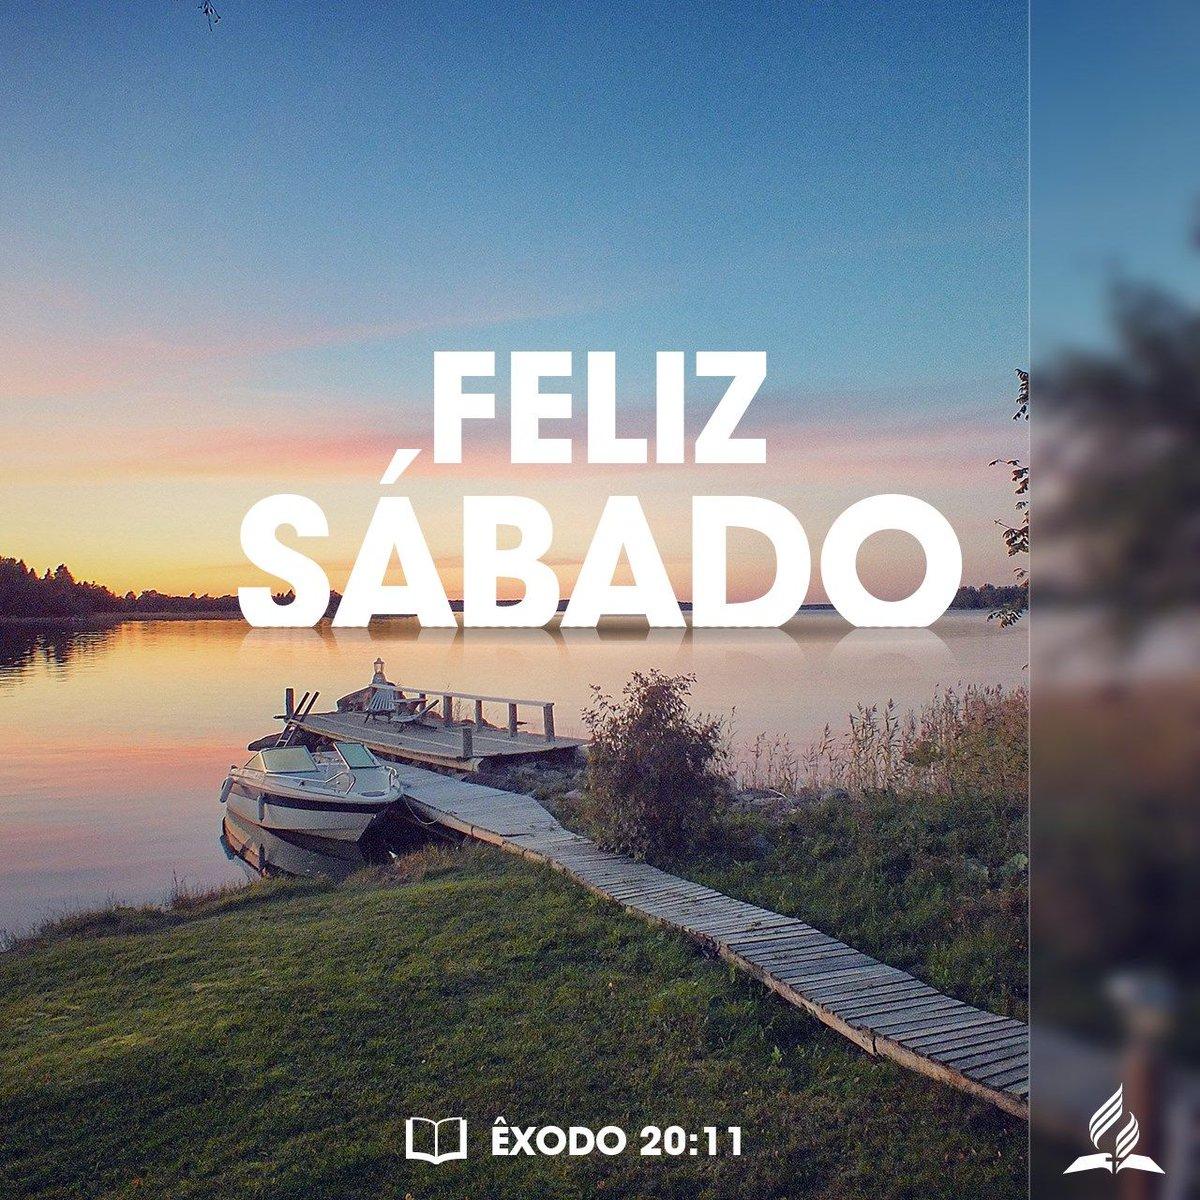 Fabian Siqueira On Twitter Feliz Sabado